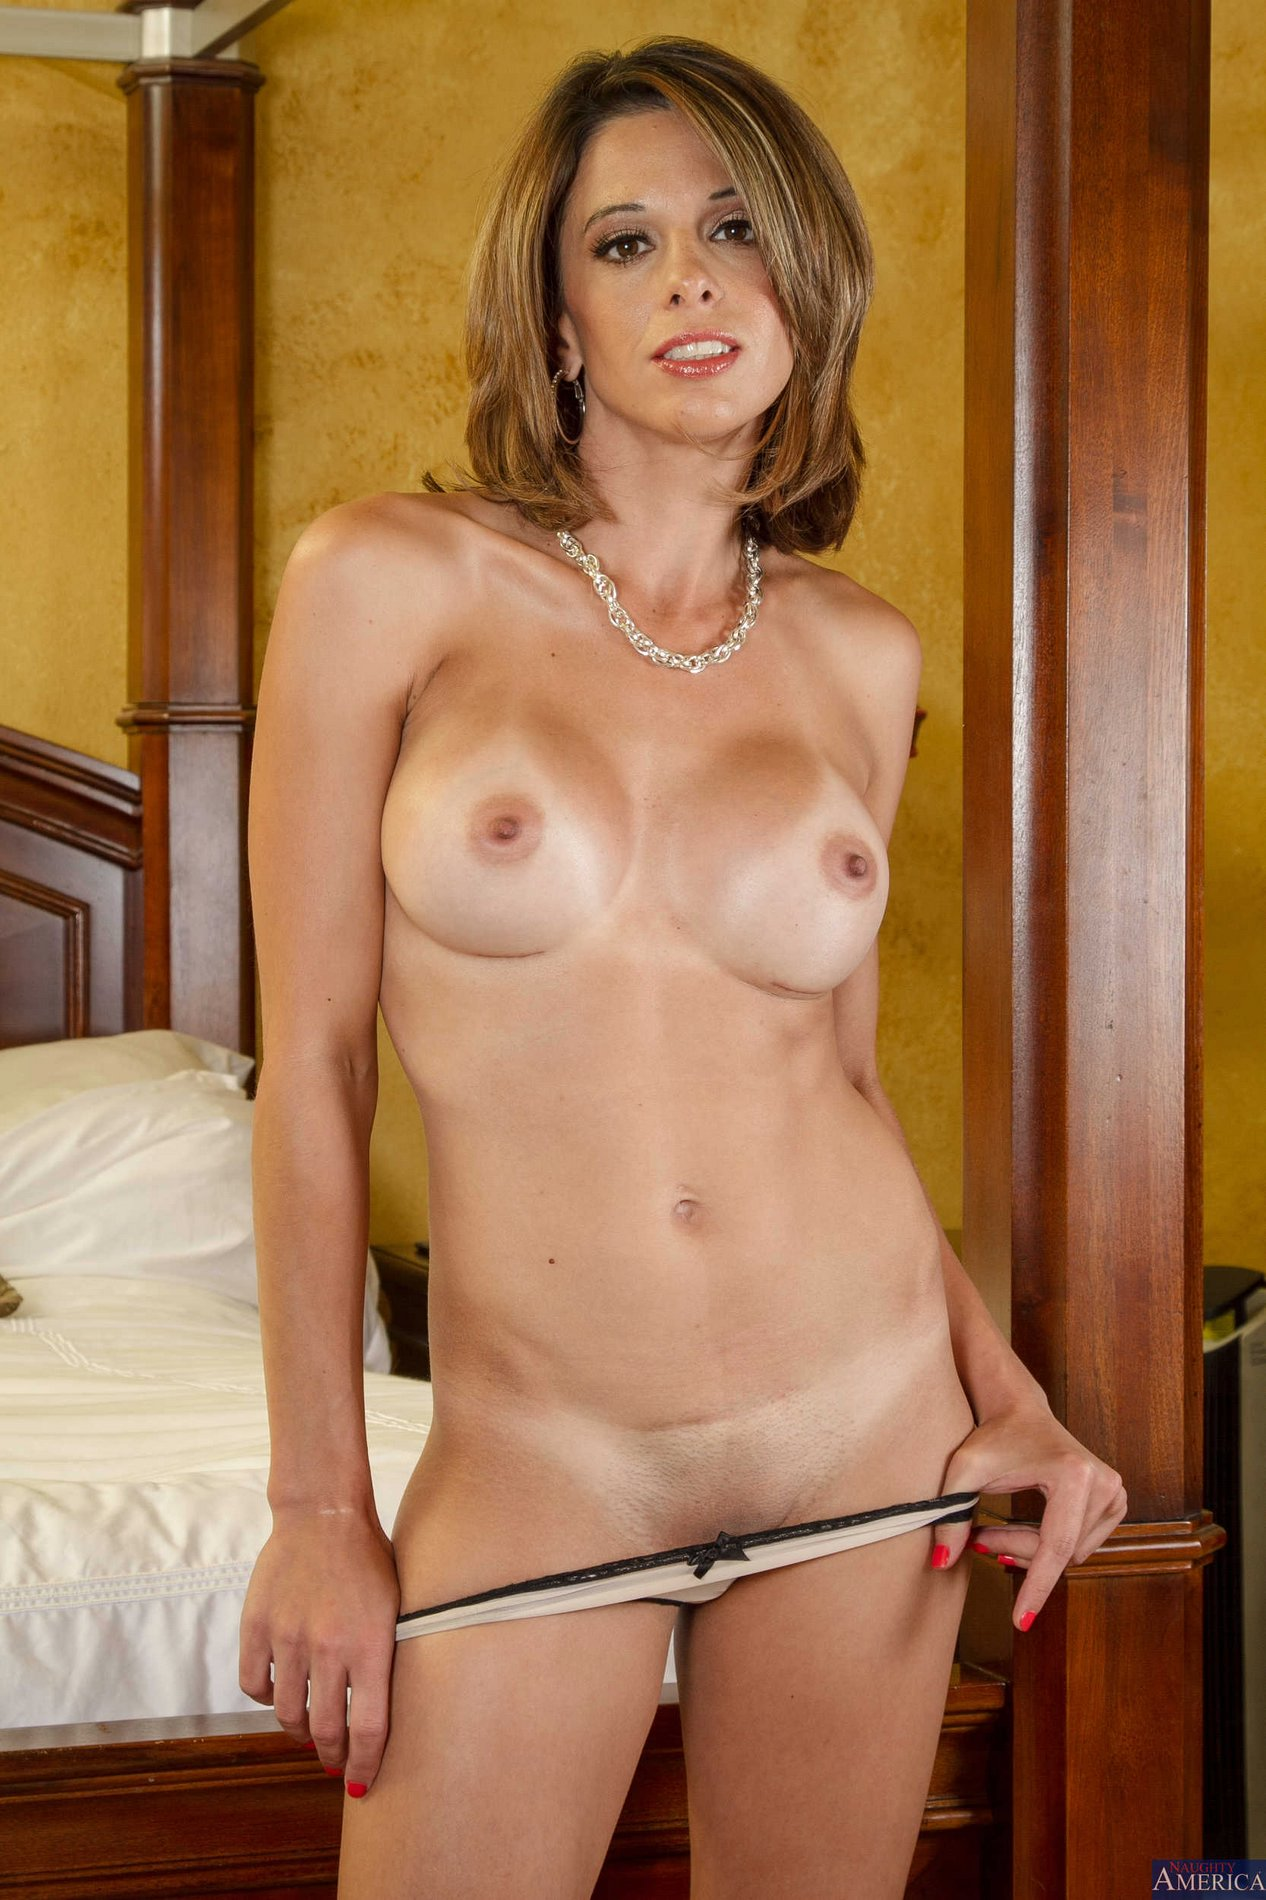 Lesbian bondage and hot wax 9